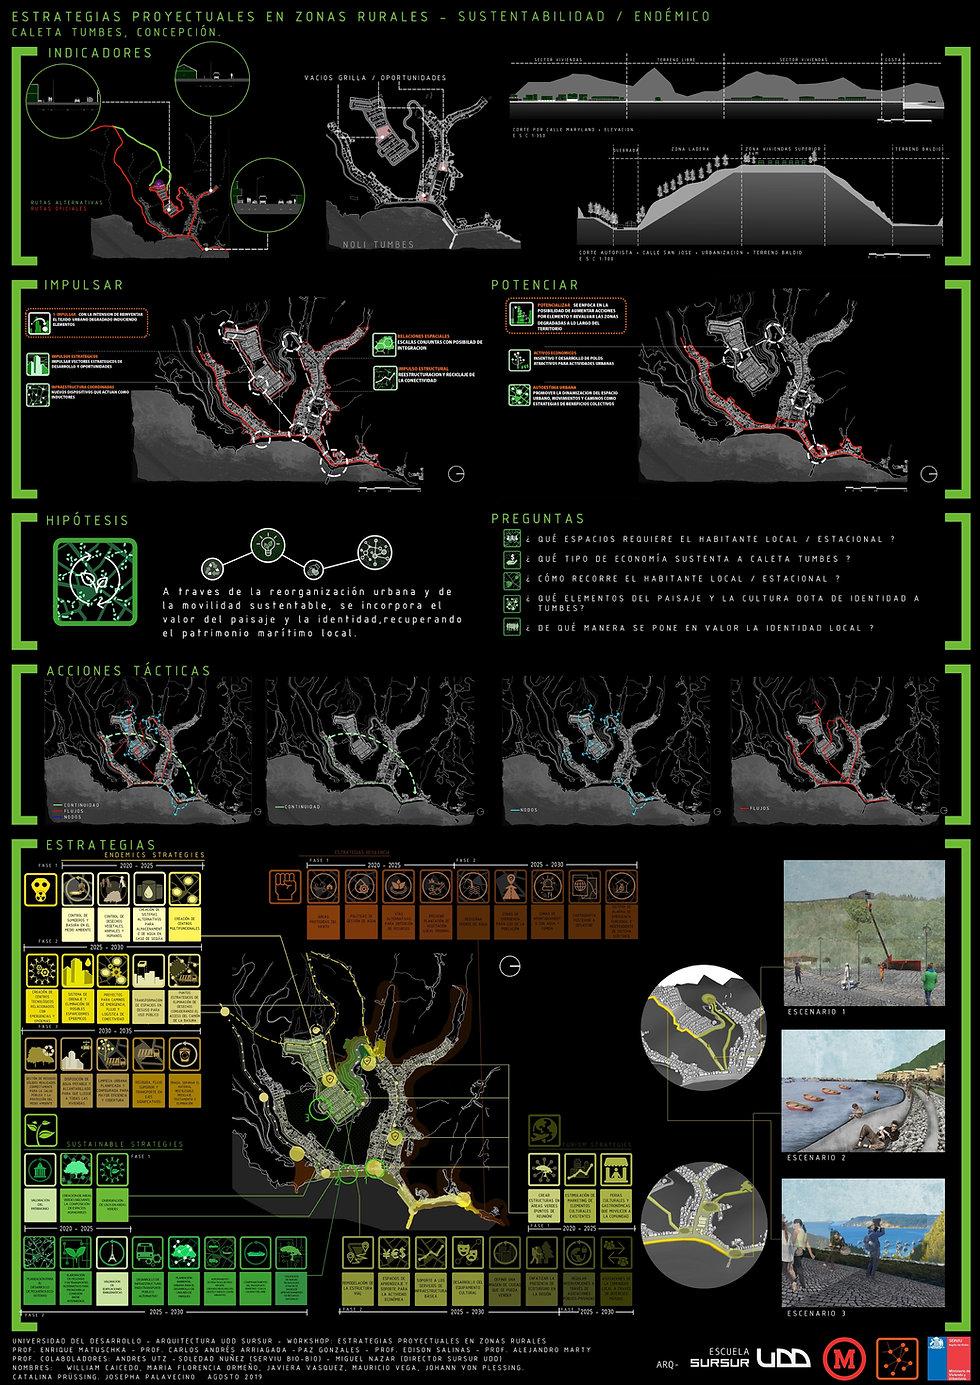 sustentabilidad-endemico.pdf_page_1.jpg